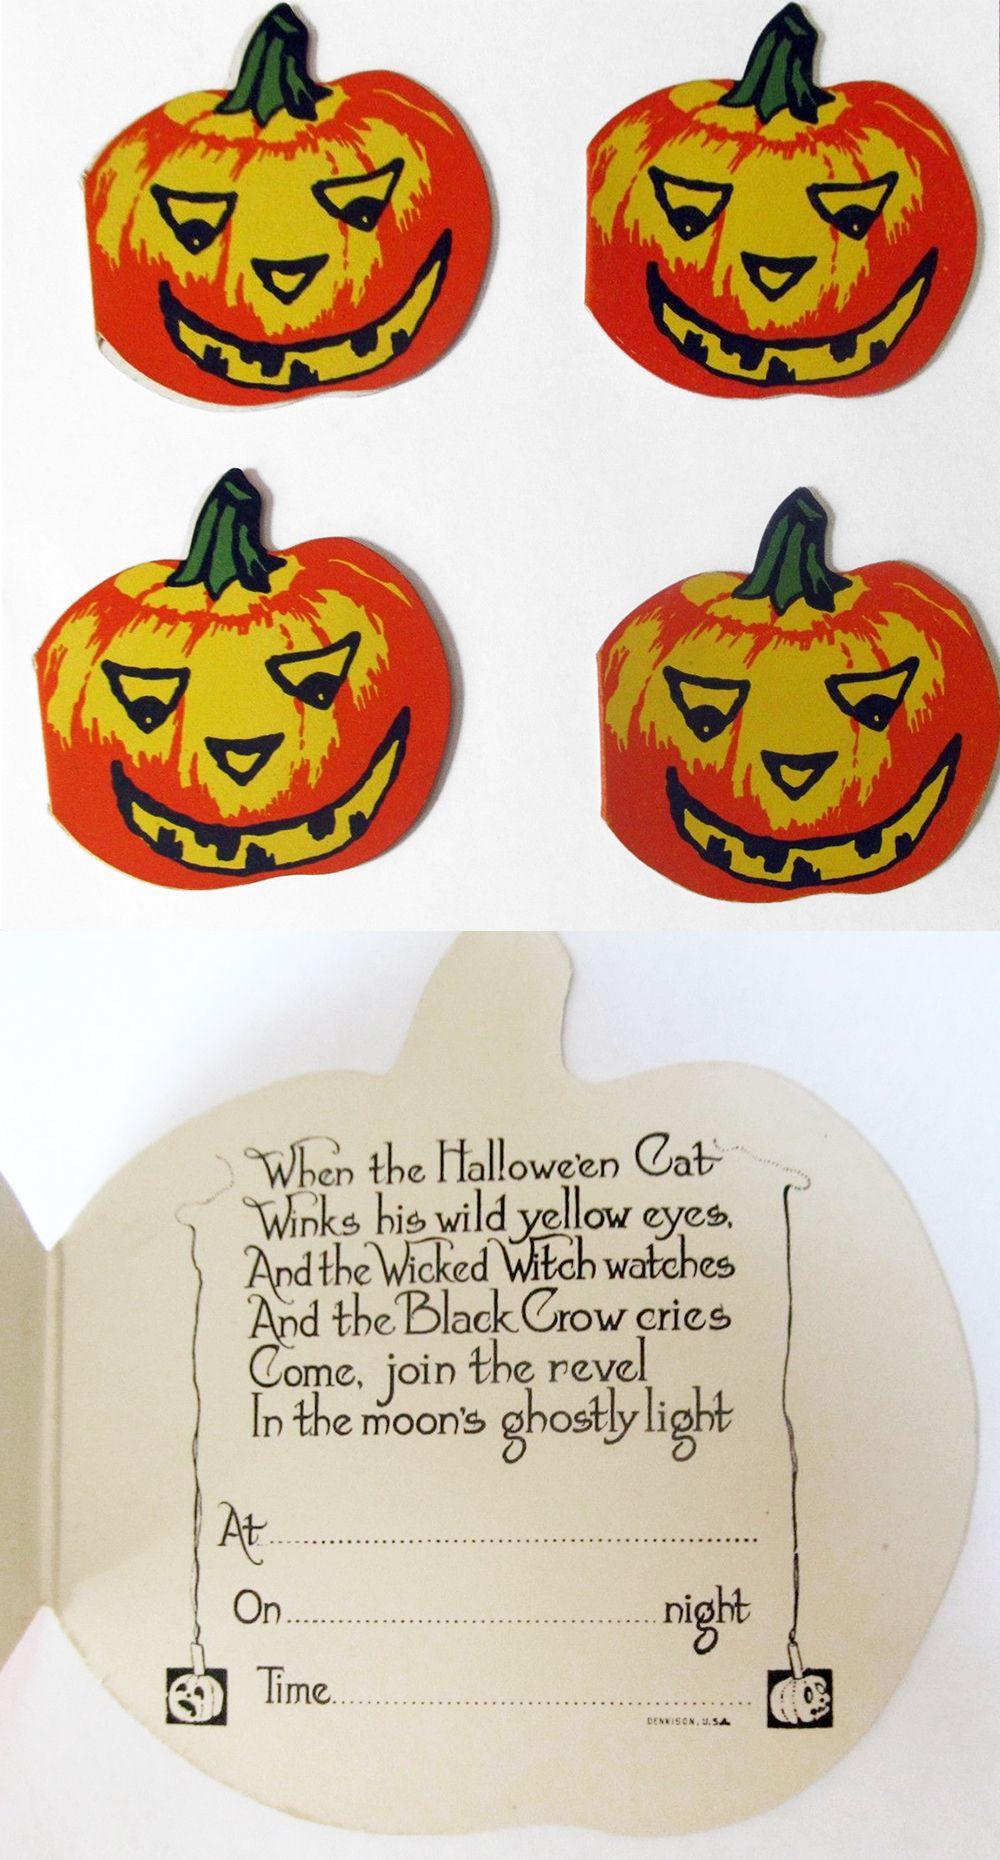 4 Dennison Jack O\'Lantern Halloween party invitations. (Lot from ...